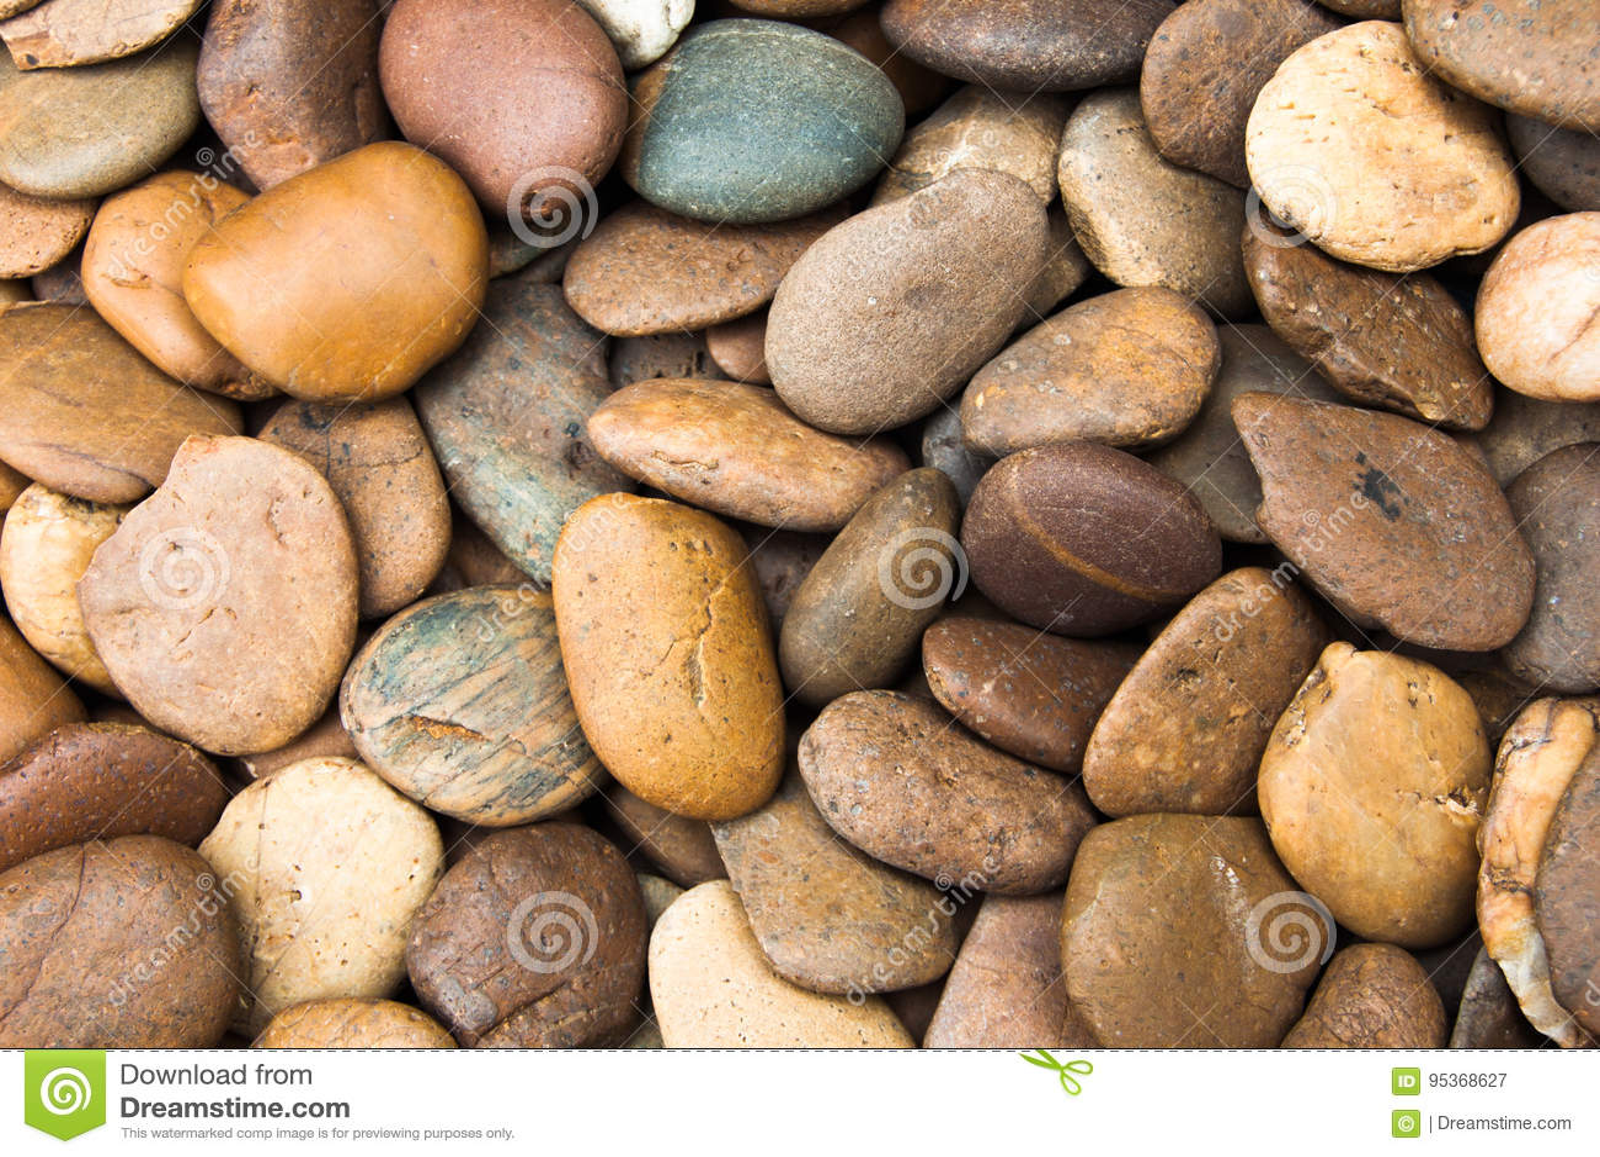 Rock background wallpaper